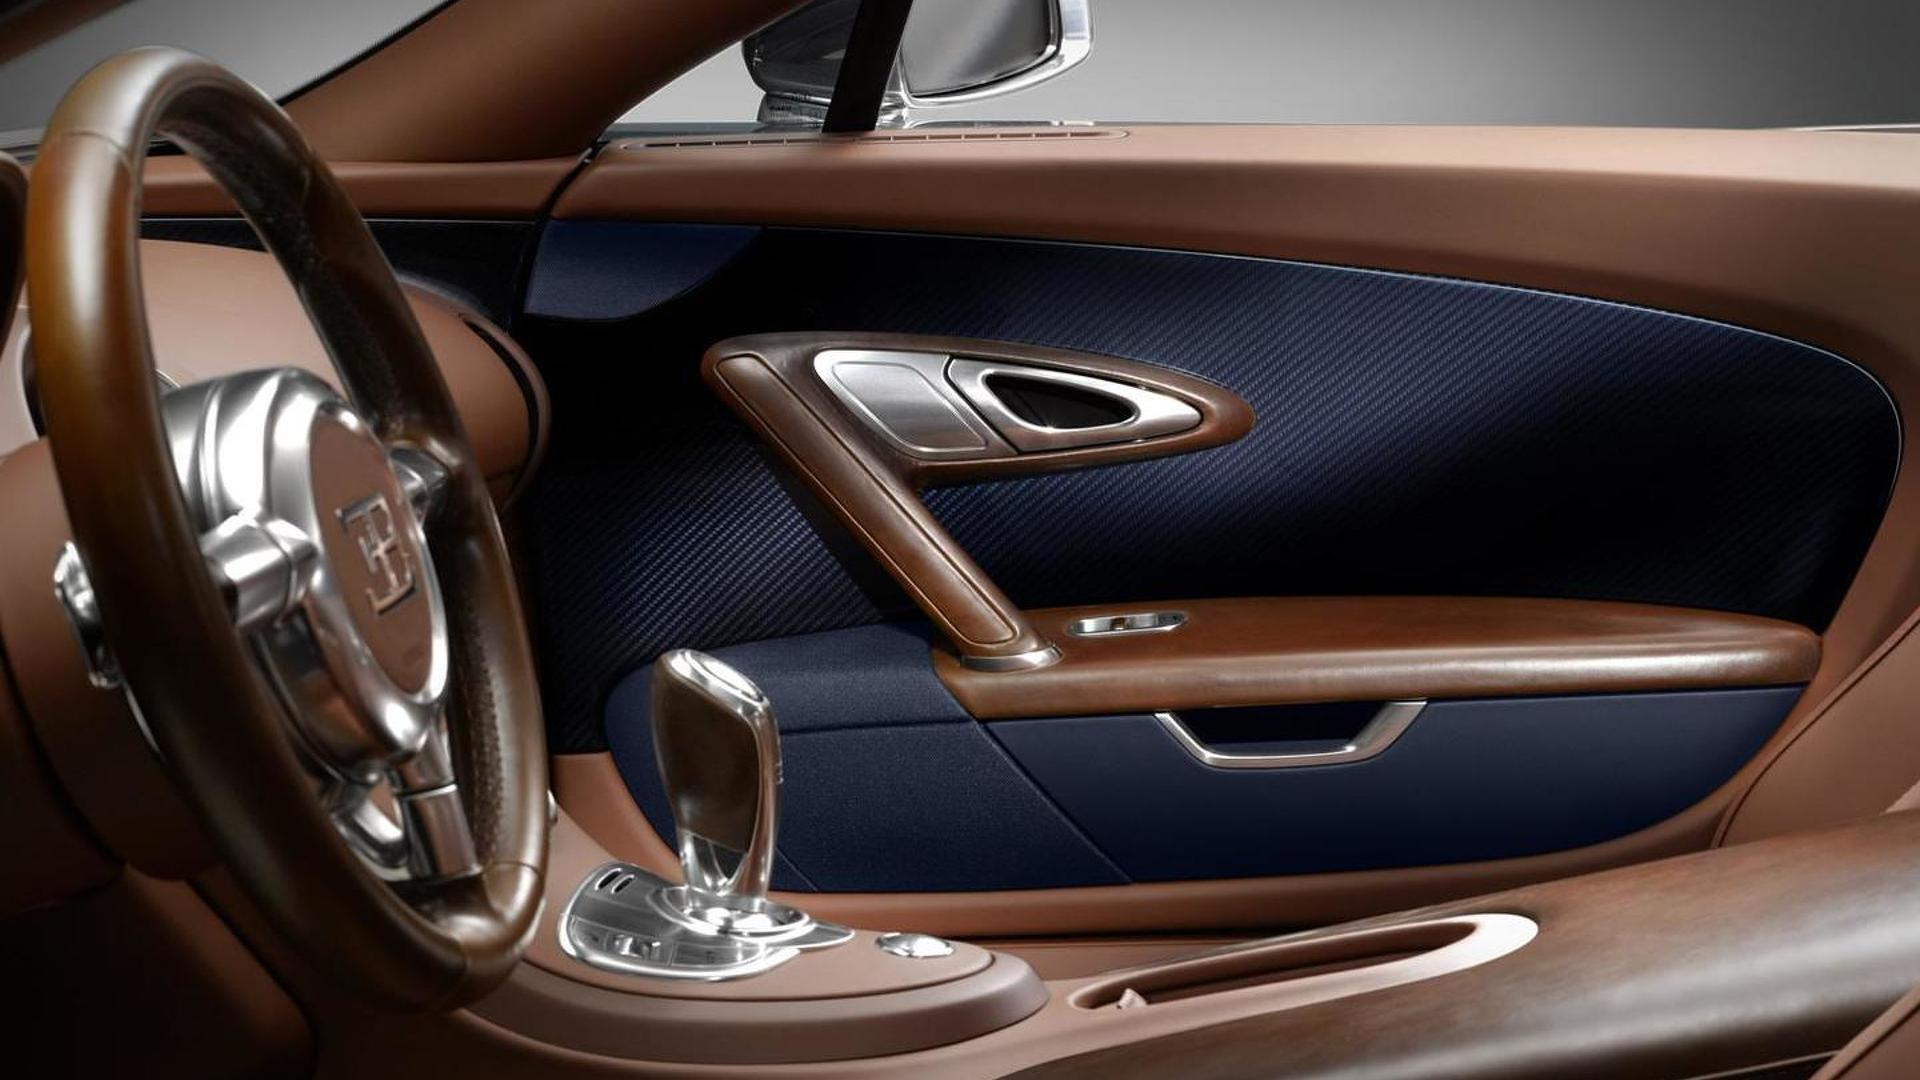 Интерьер Bugatti Veyron Ettore Bugatti Edition